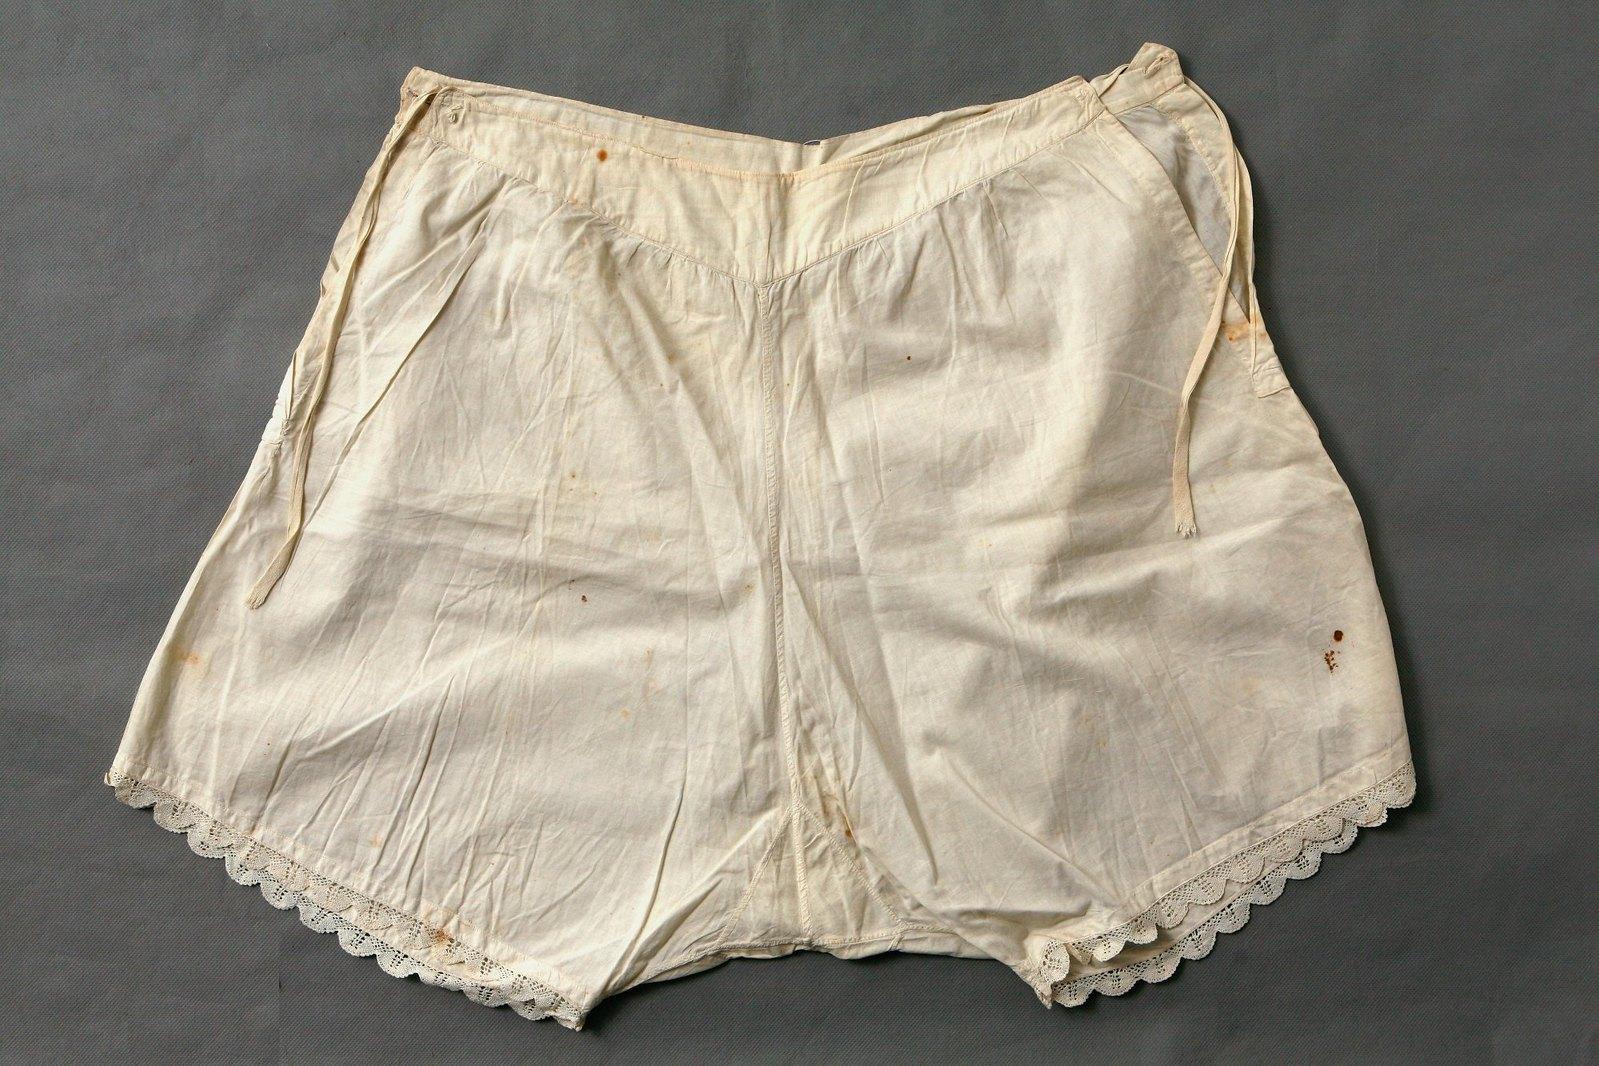 Панталоны дамские. Начало XX в.1